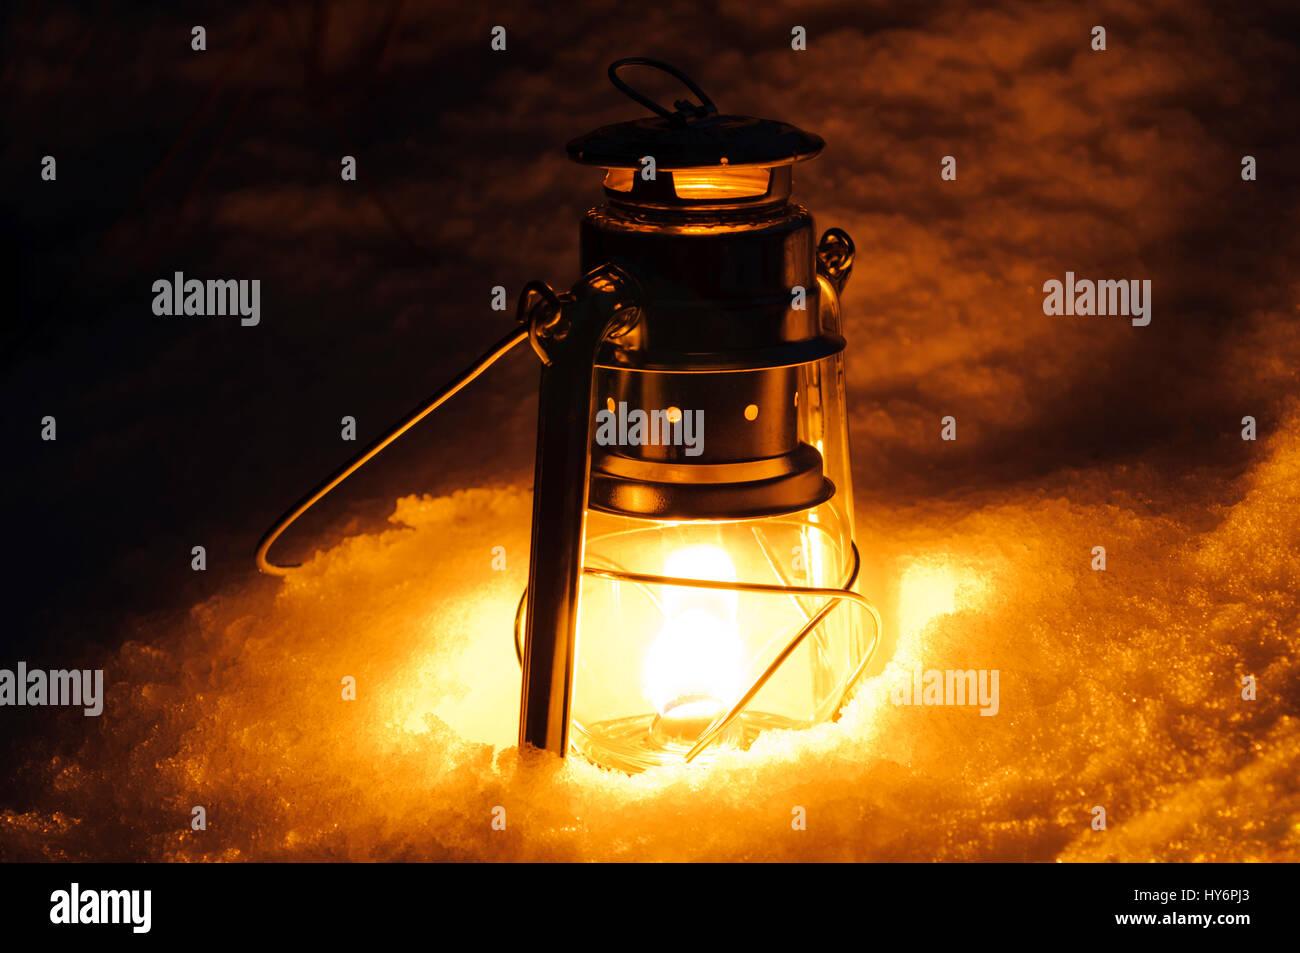 Kerosene lamp in the snow at night. - Stock Image